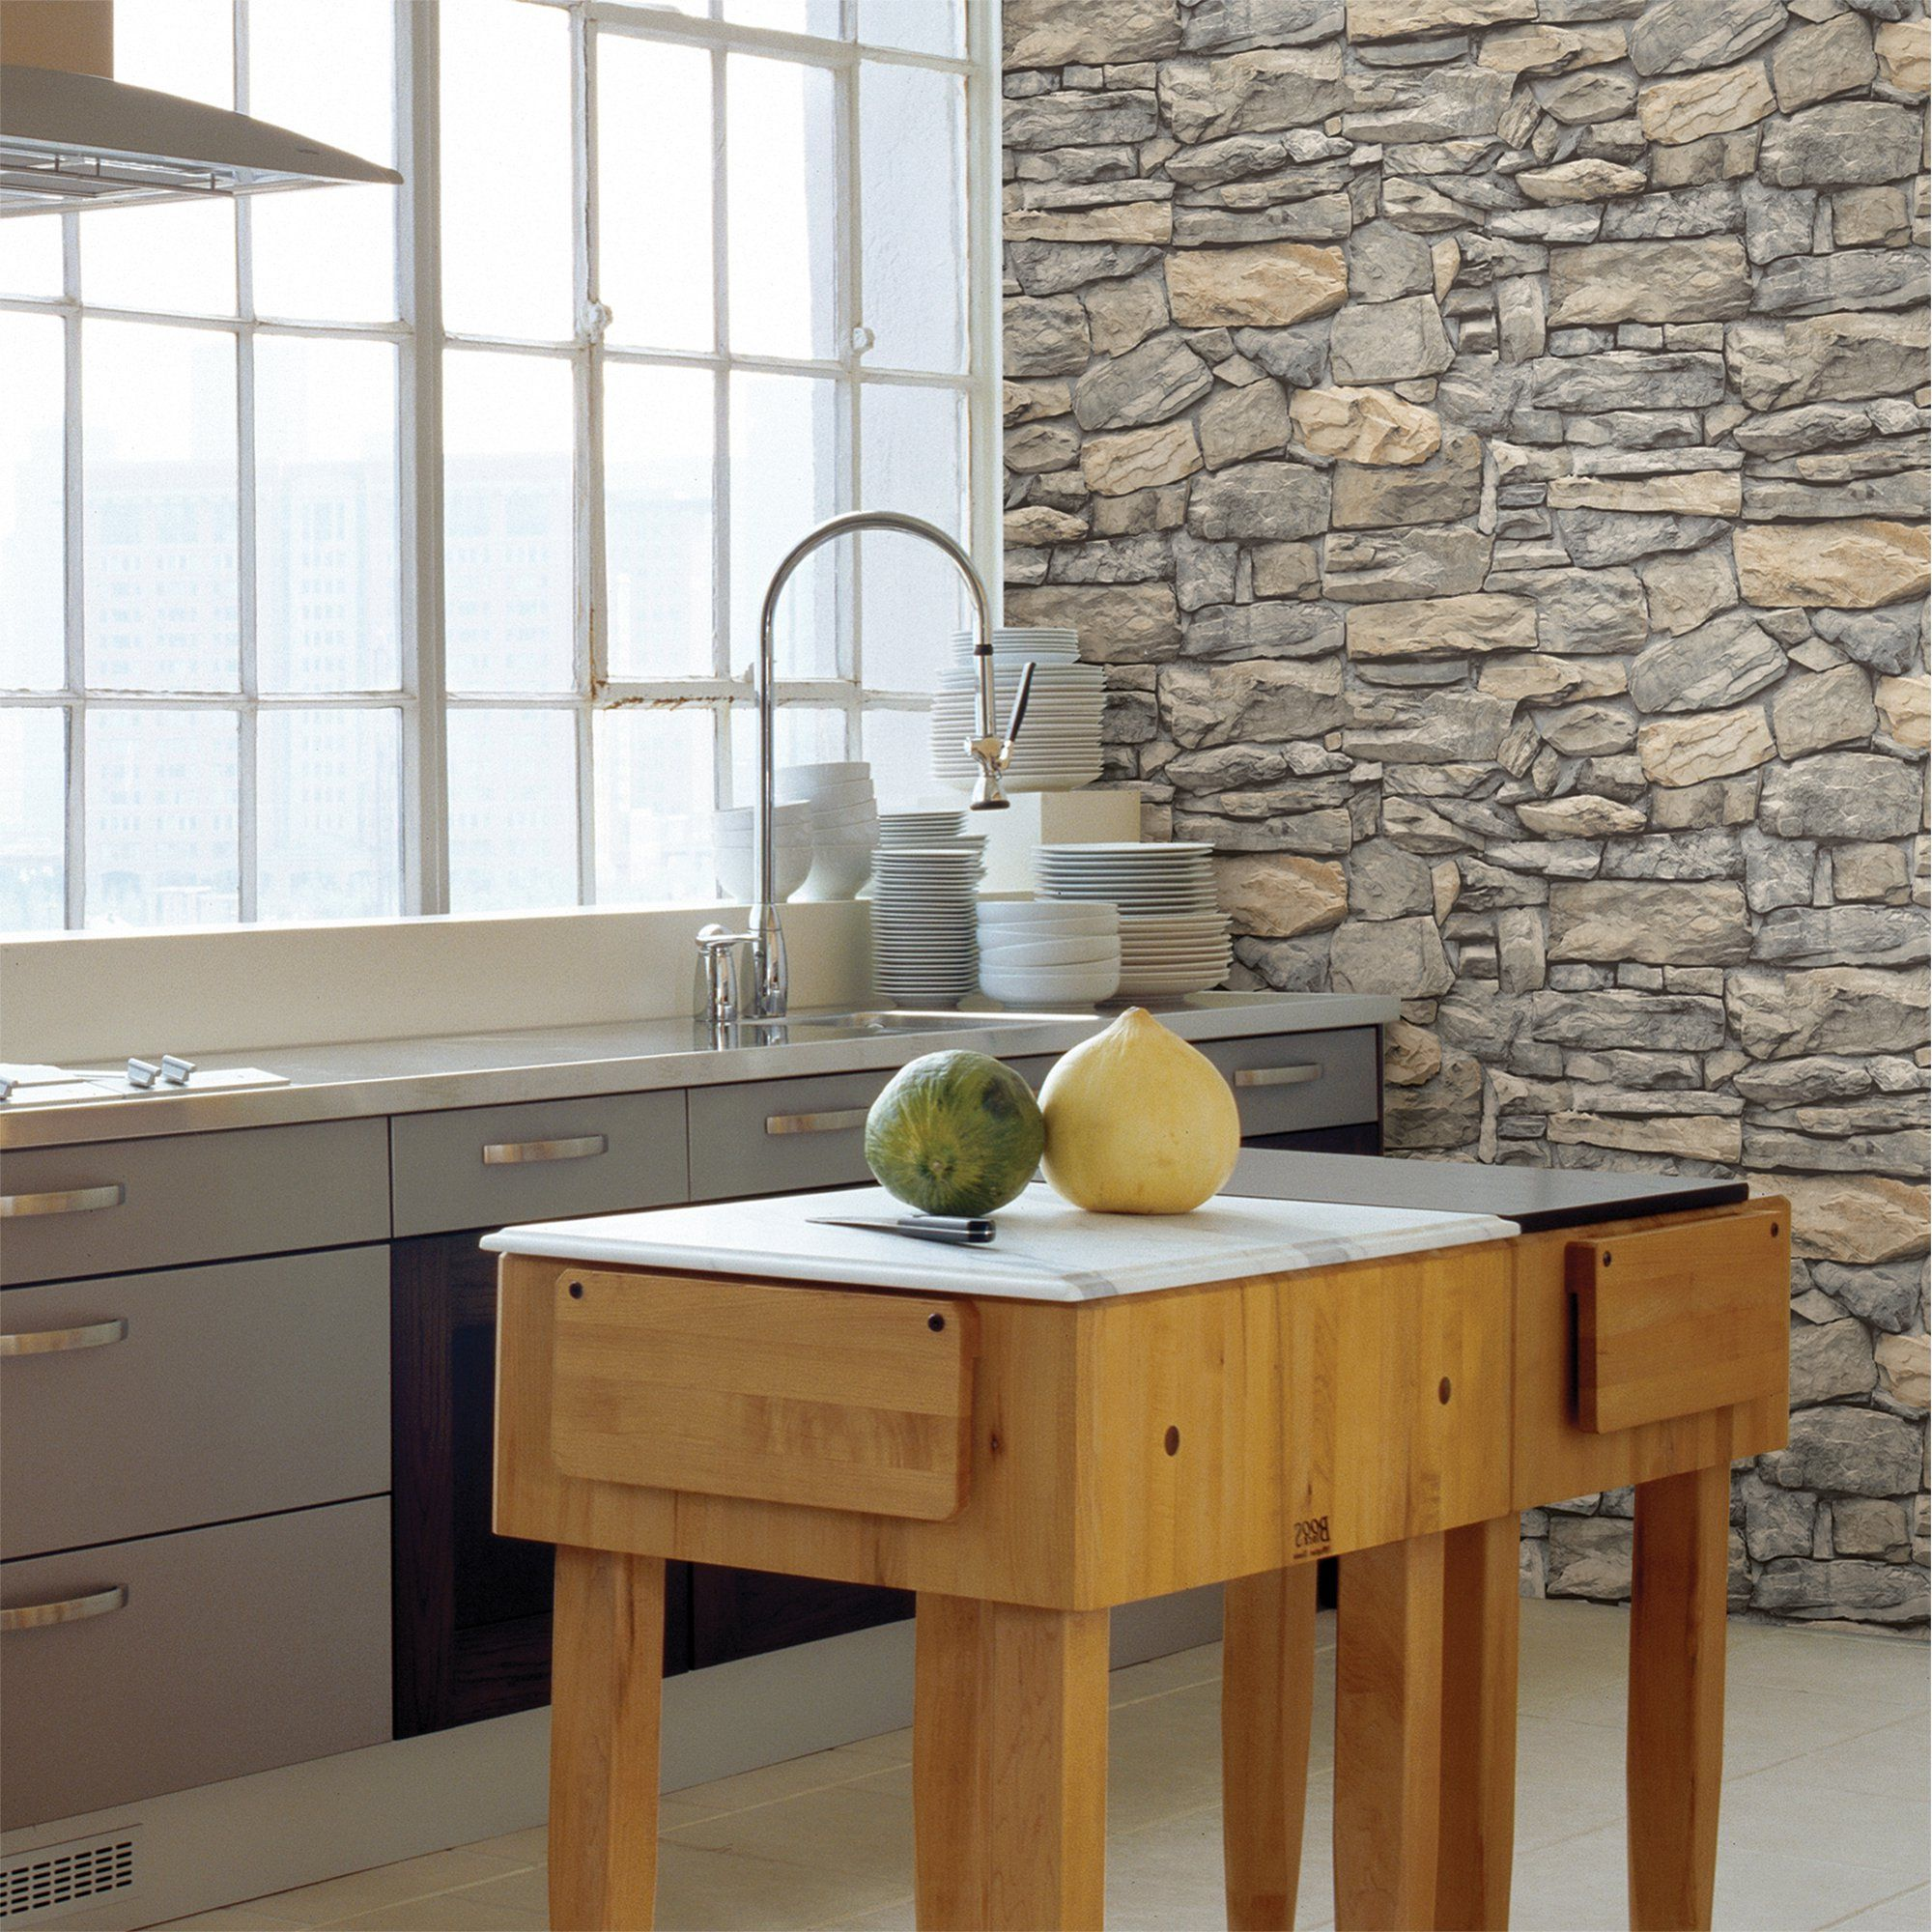 Inhome Kilkenny Stone Peel Stick Wallpaper Walmart Com In 2021 Peel And Stick Wallpaper Stone Wallpaper Stone Design